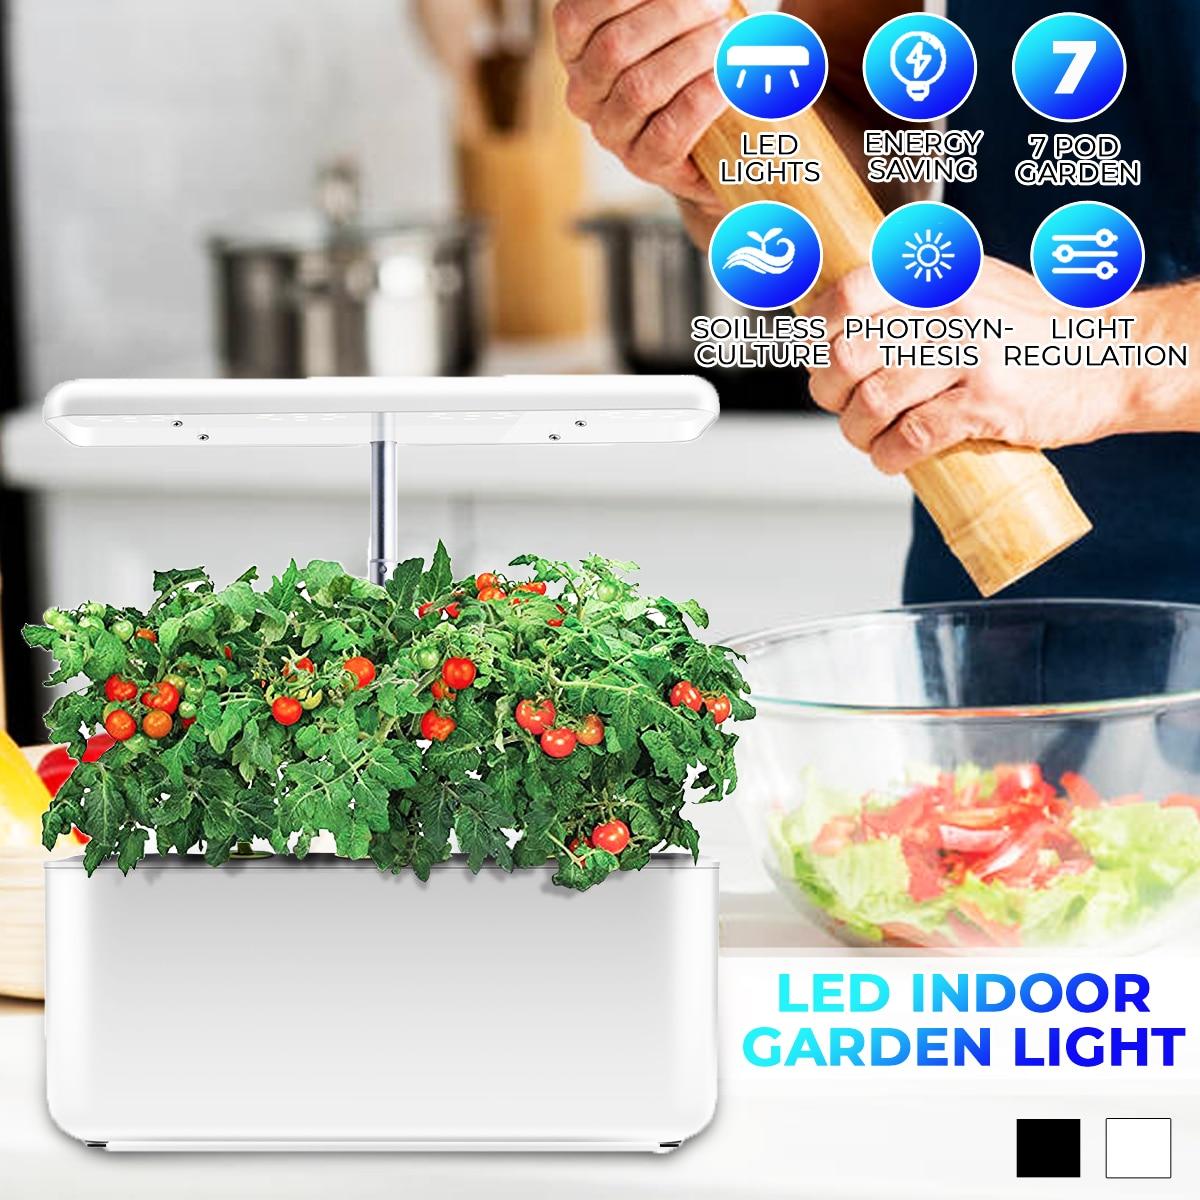 Ecoo Grower Indoor Plant Hydroponics Grow Light Soilless Cultivation Plant Grow Light Auto Flower Nursery Pot For Plant Nursery